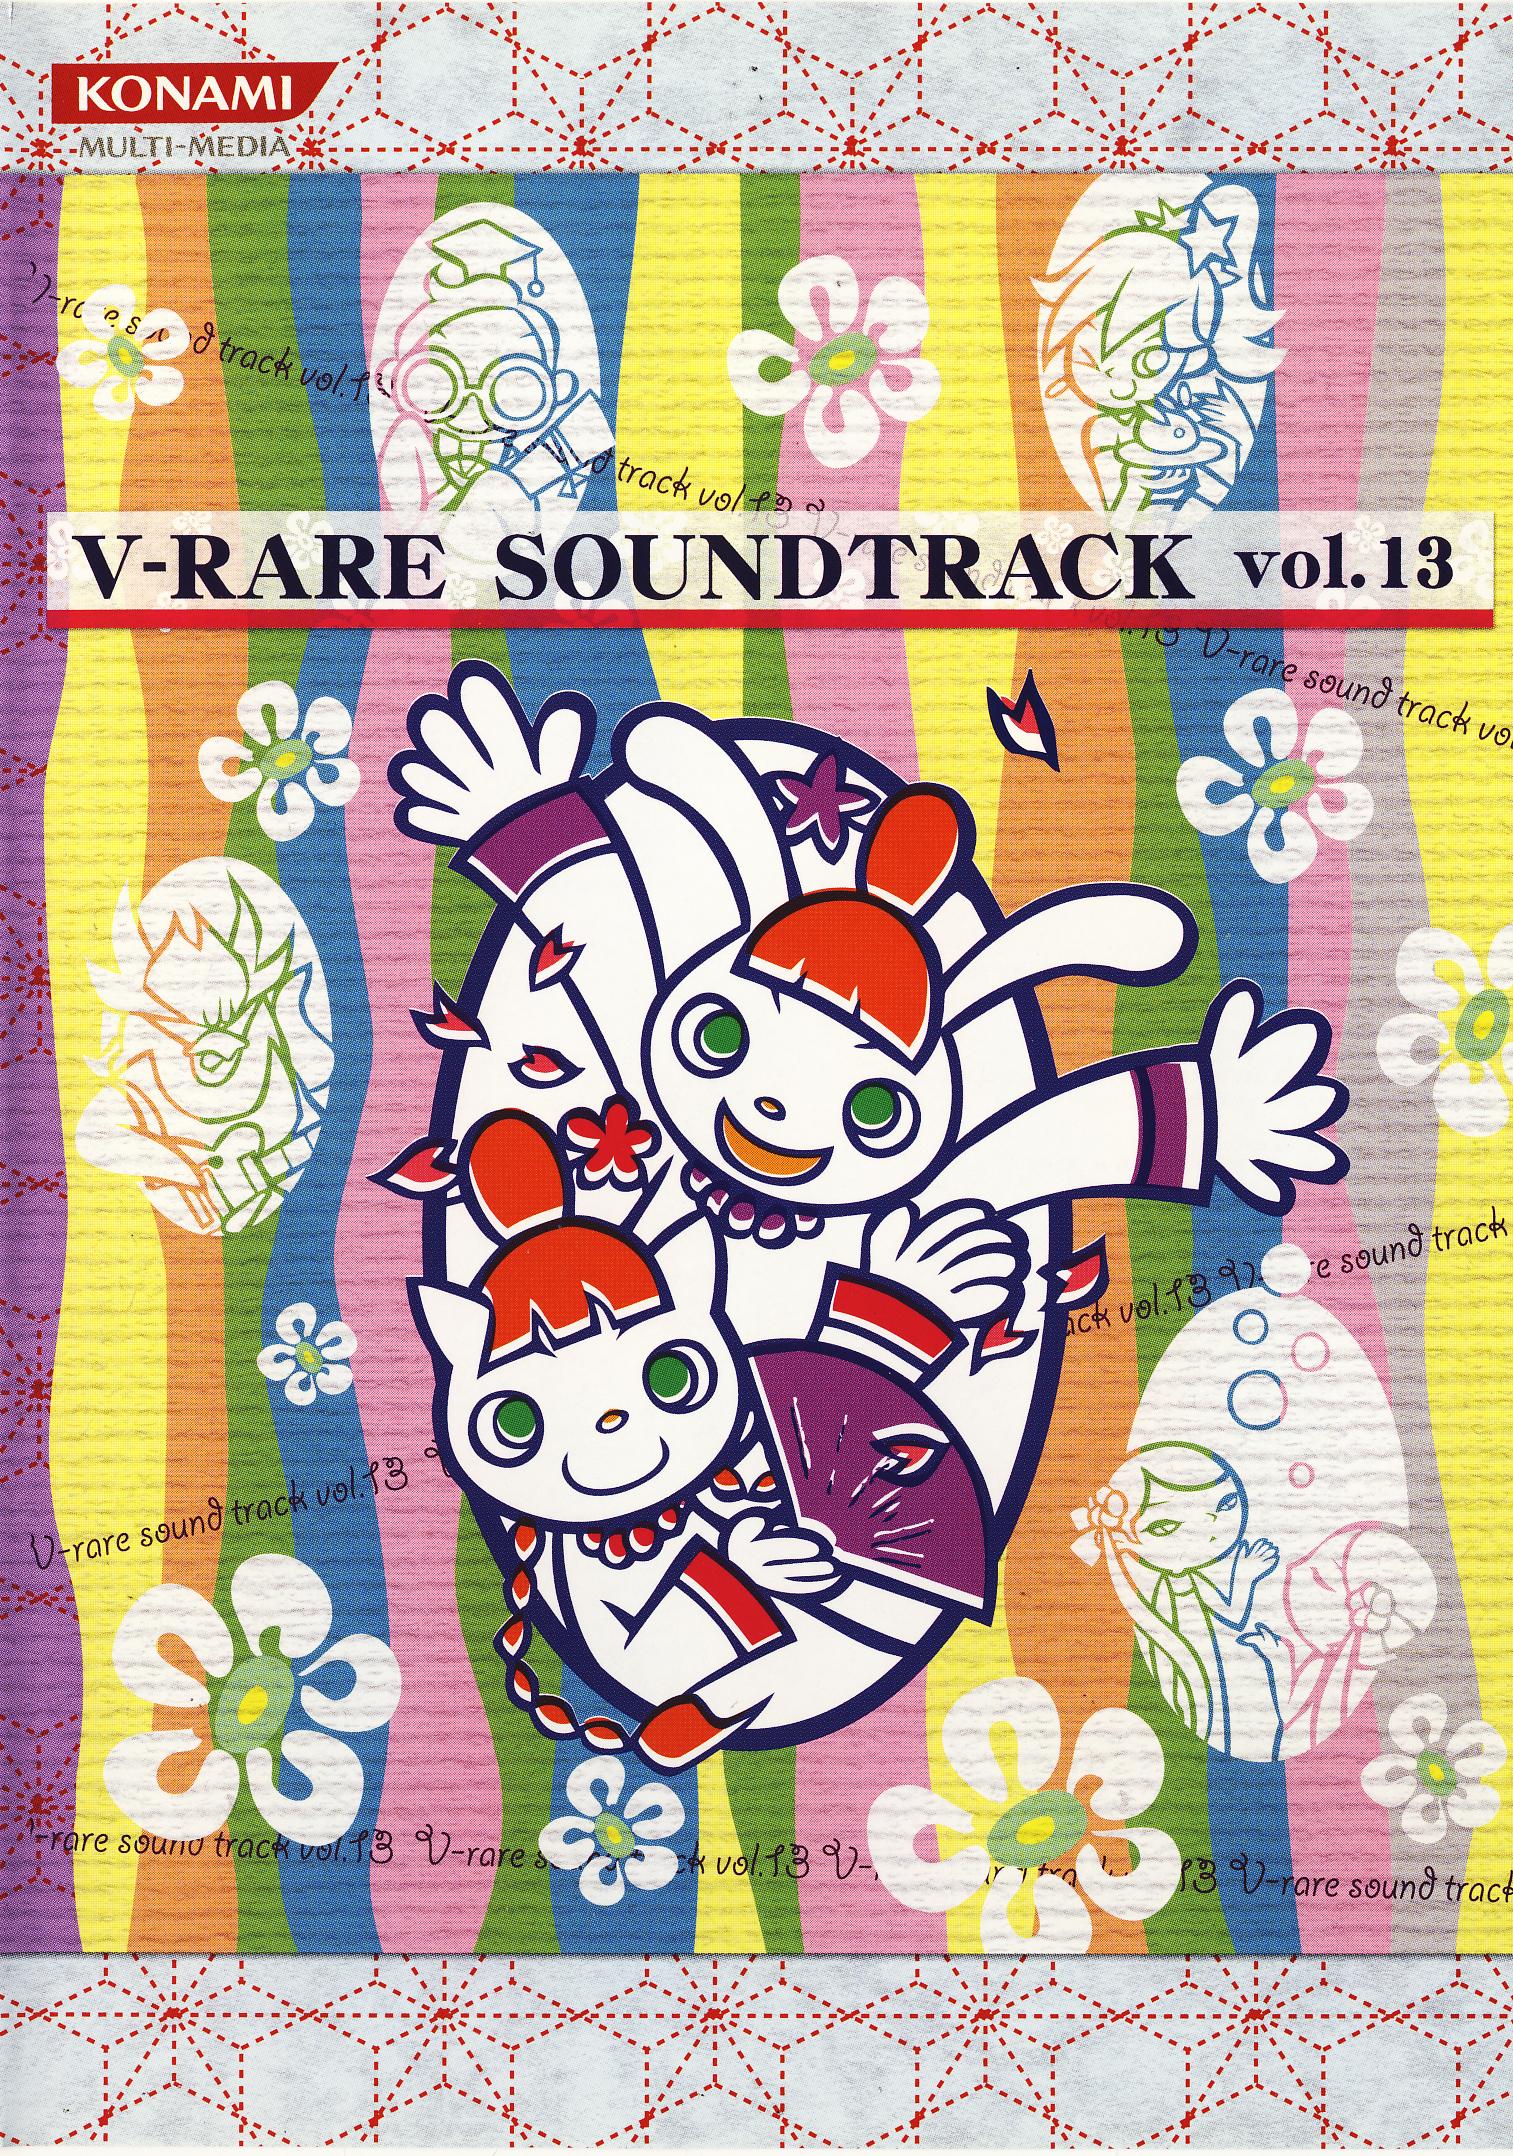 Image - V-RARE SOUNDTRACK 13 - pop'n music 12 iroha.jpg | Pop'n Music Wiki | FANDOM powered by Wikia